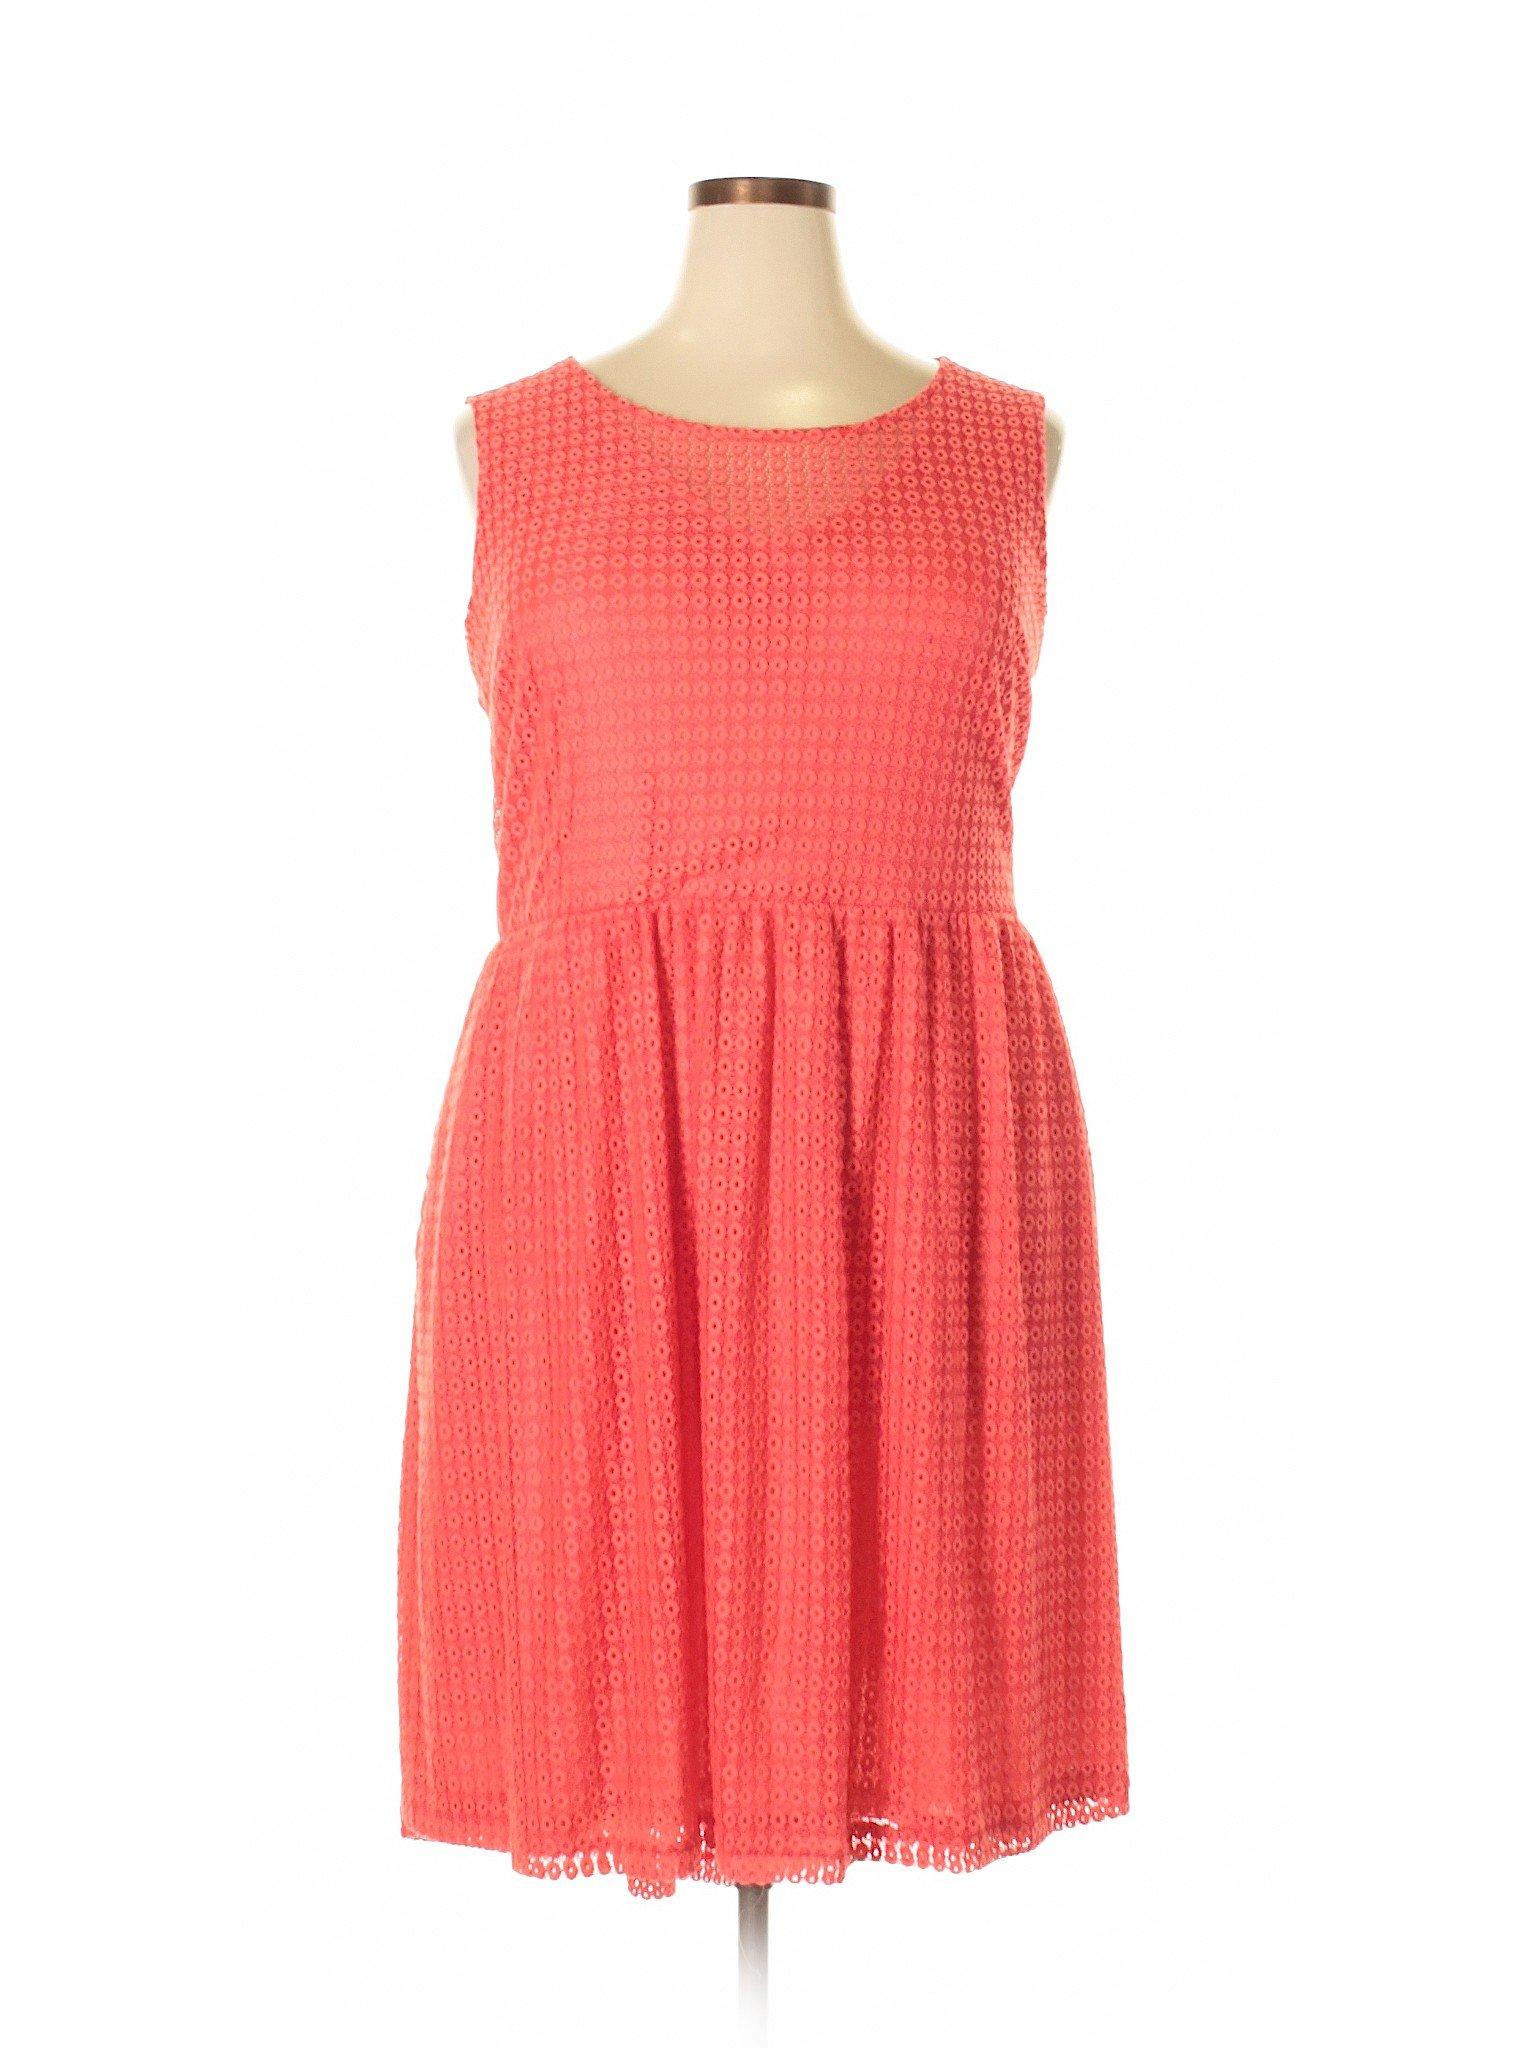 Dress Boutique 9 winter Apt Casual BwOIxwqg